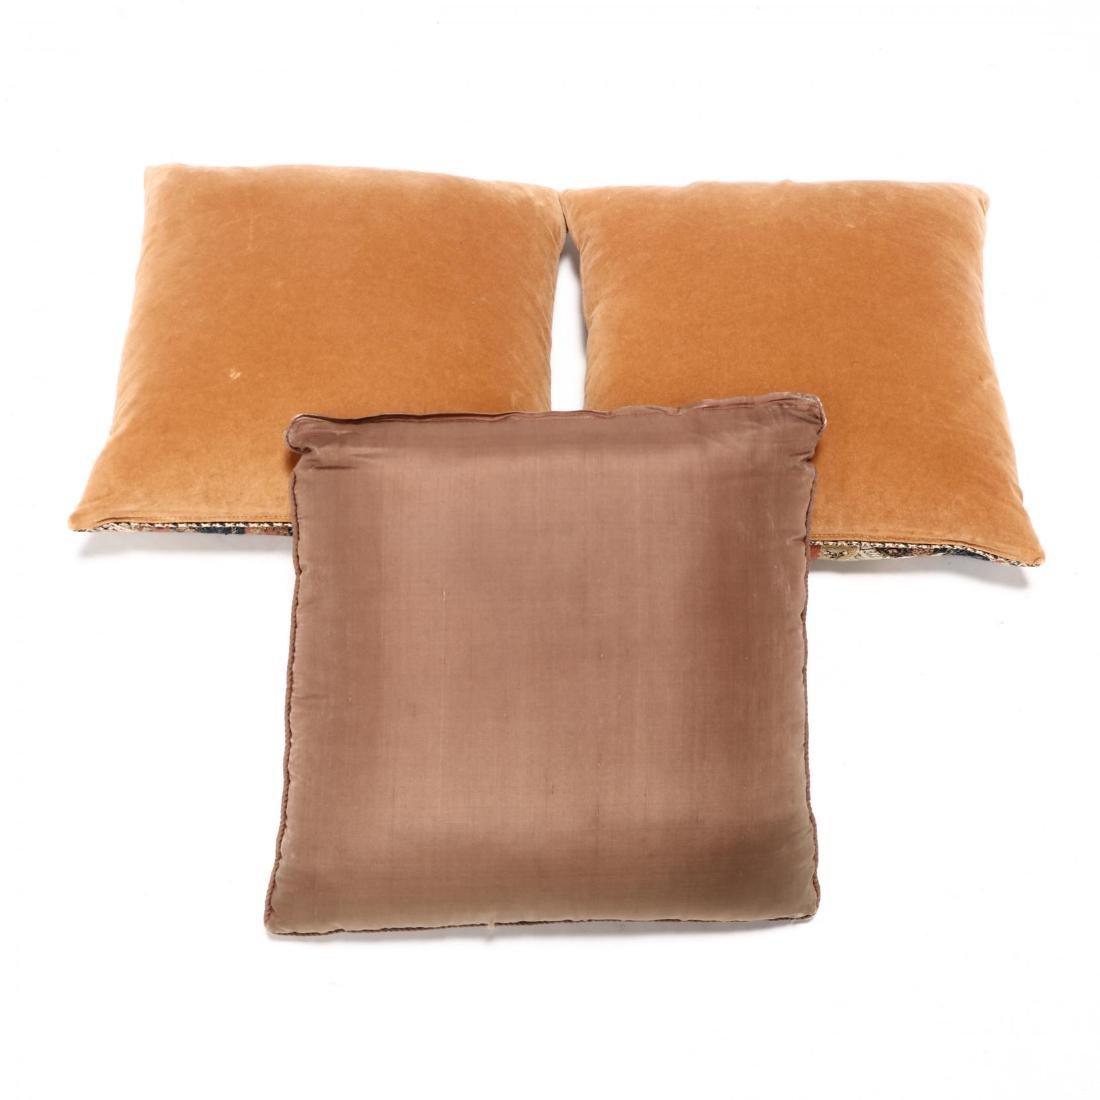 Three Elizabethan Style Pillows - 2